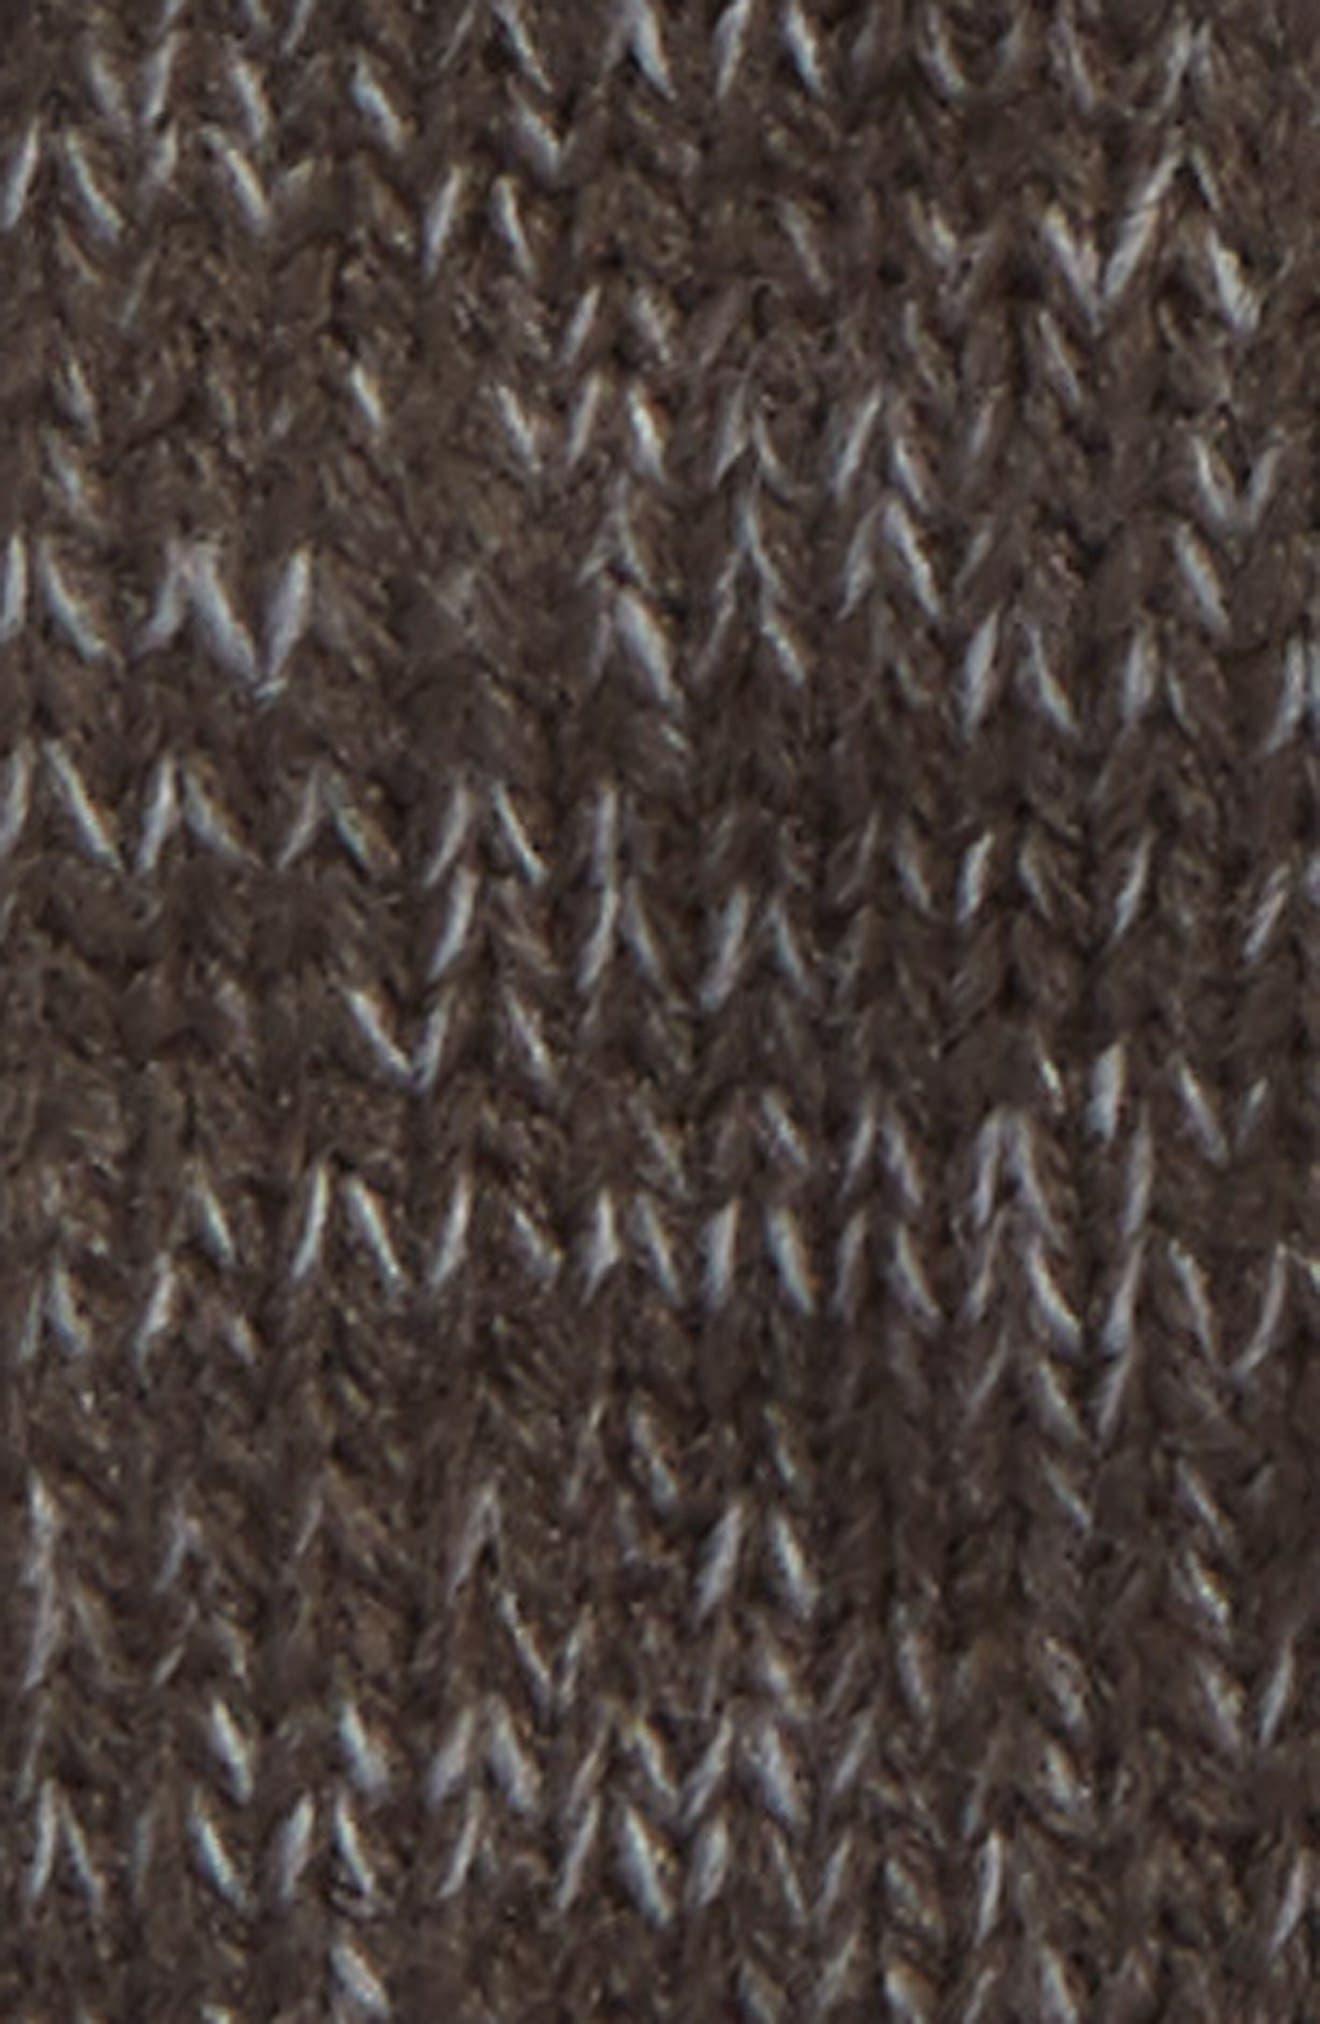 Etip Salty Dog Knit Tech Gloves,                             Alternate thumbnail 3, color,                             GRAPHITE GREY/ MID GREY MARL